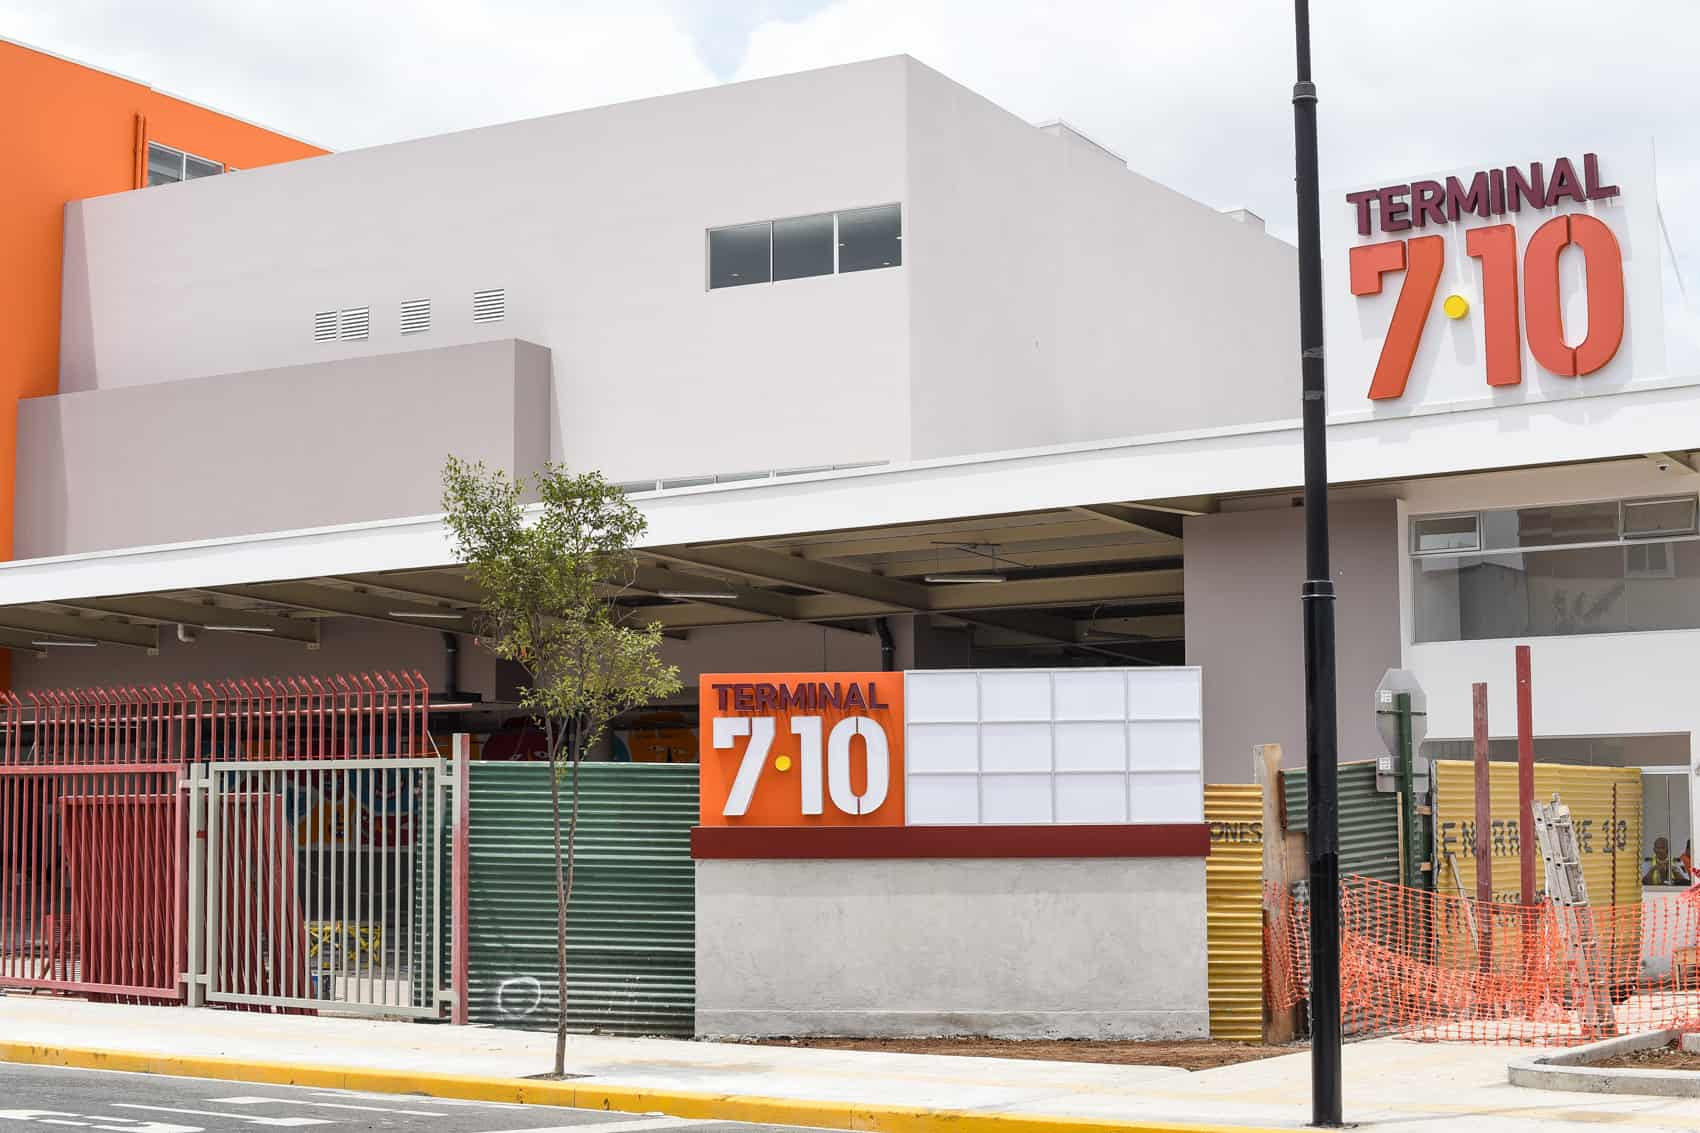 Terminal 7-10 in San José, July 29 2015